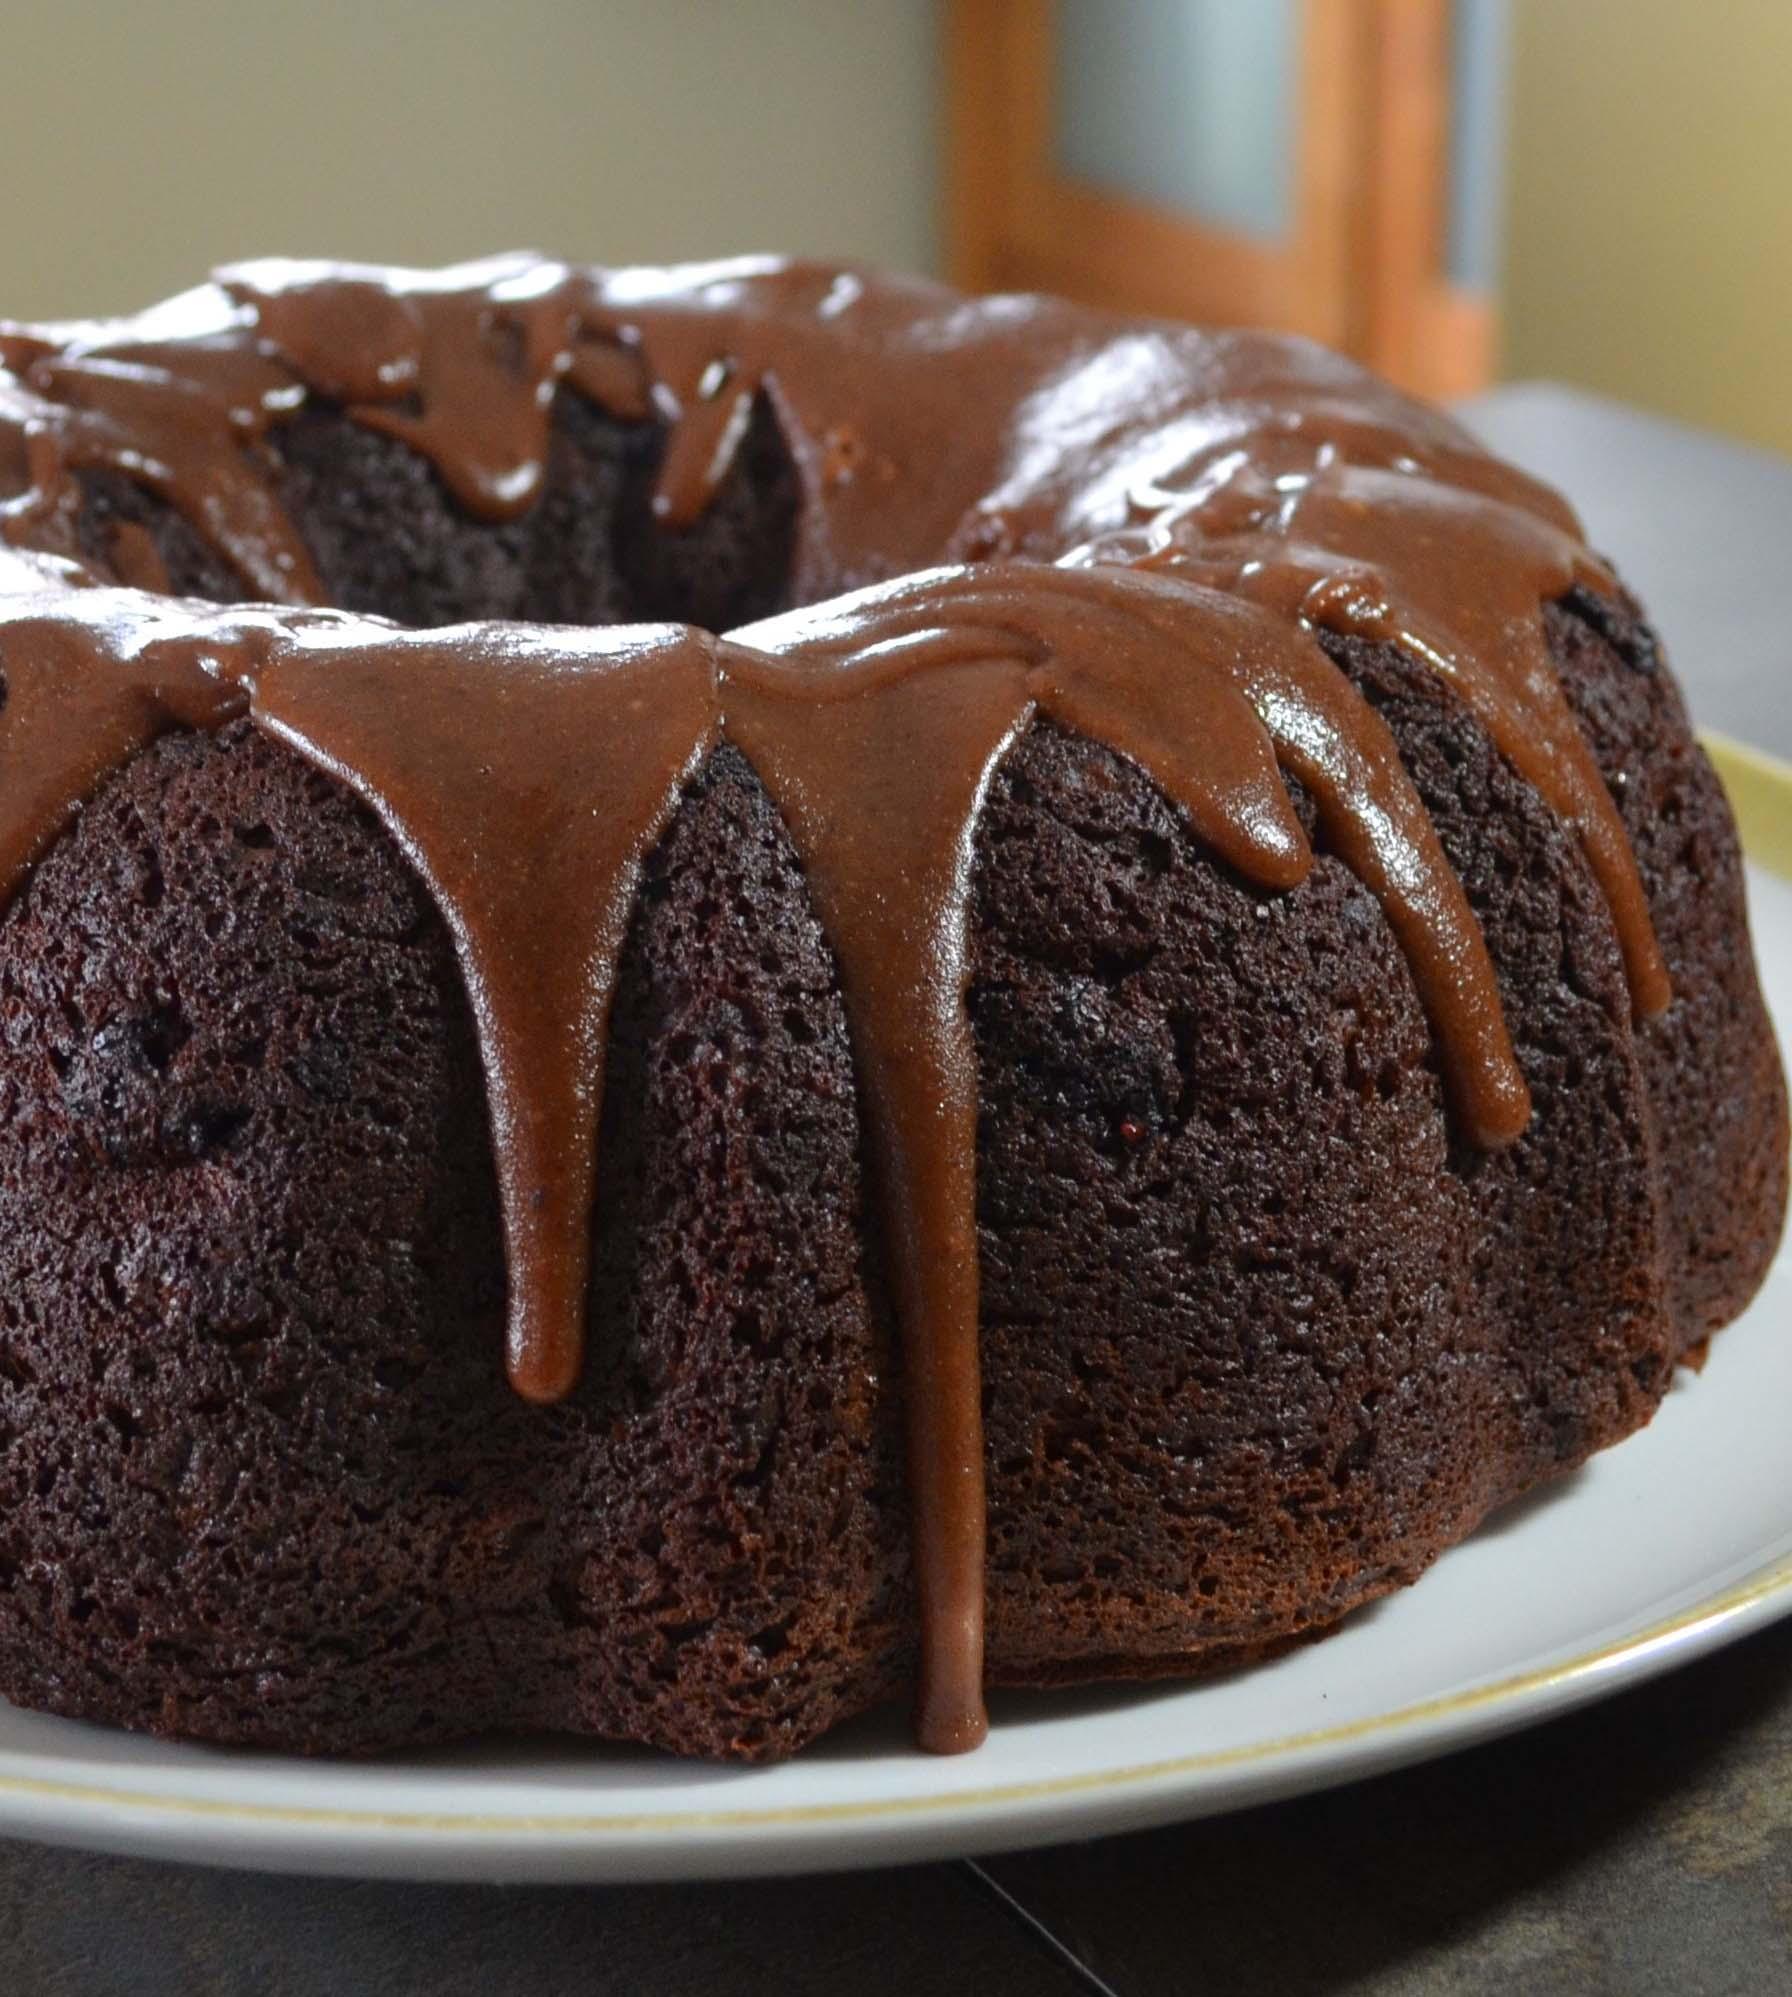 Ronie's Romance Chocolate Cake Recipe 2